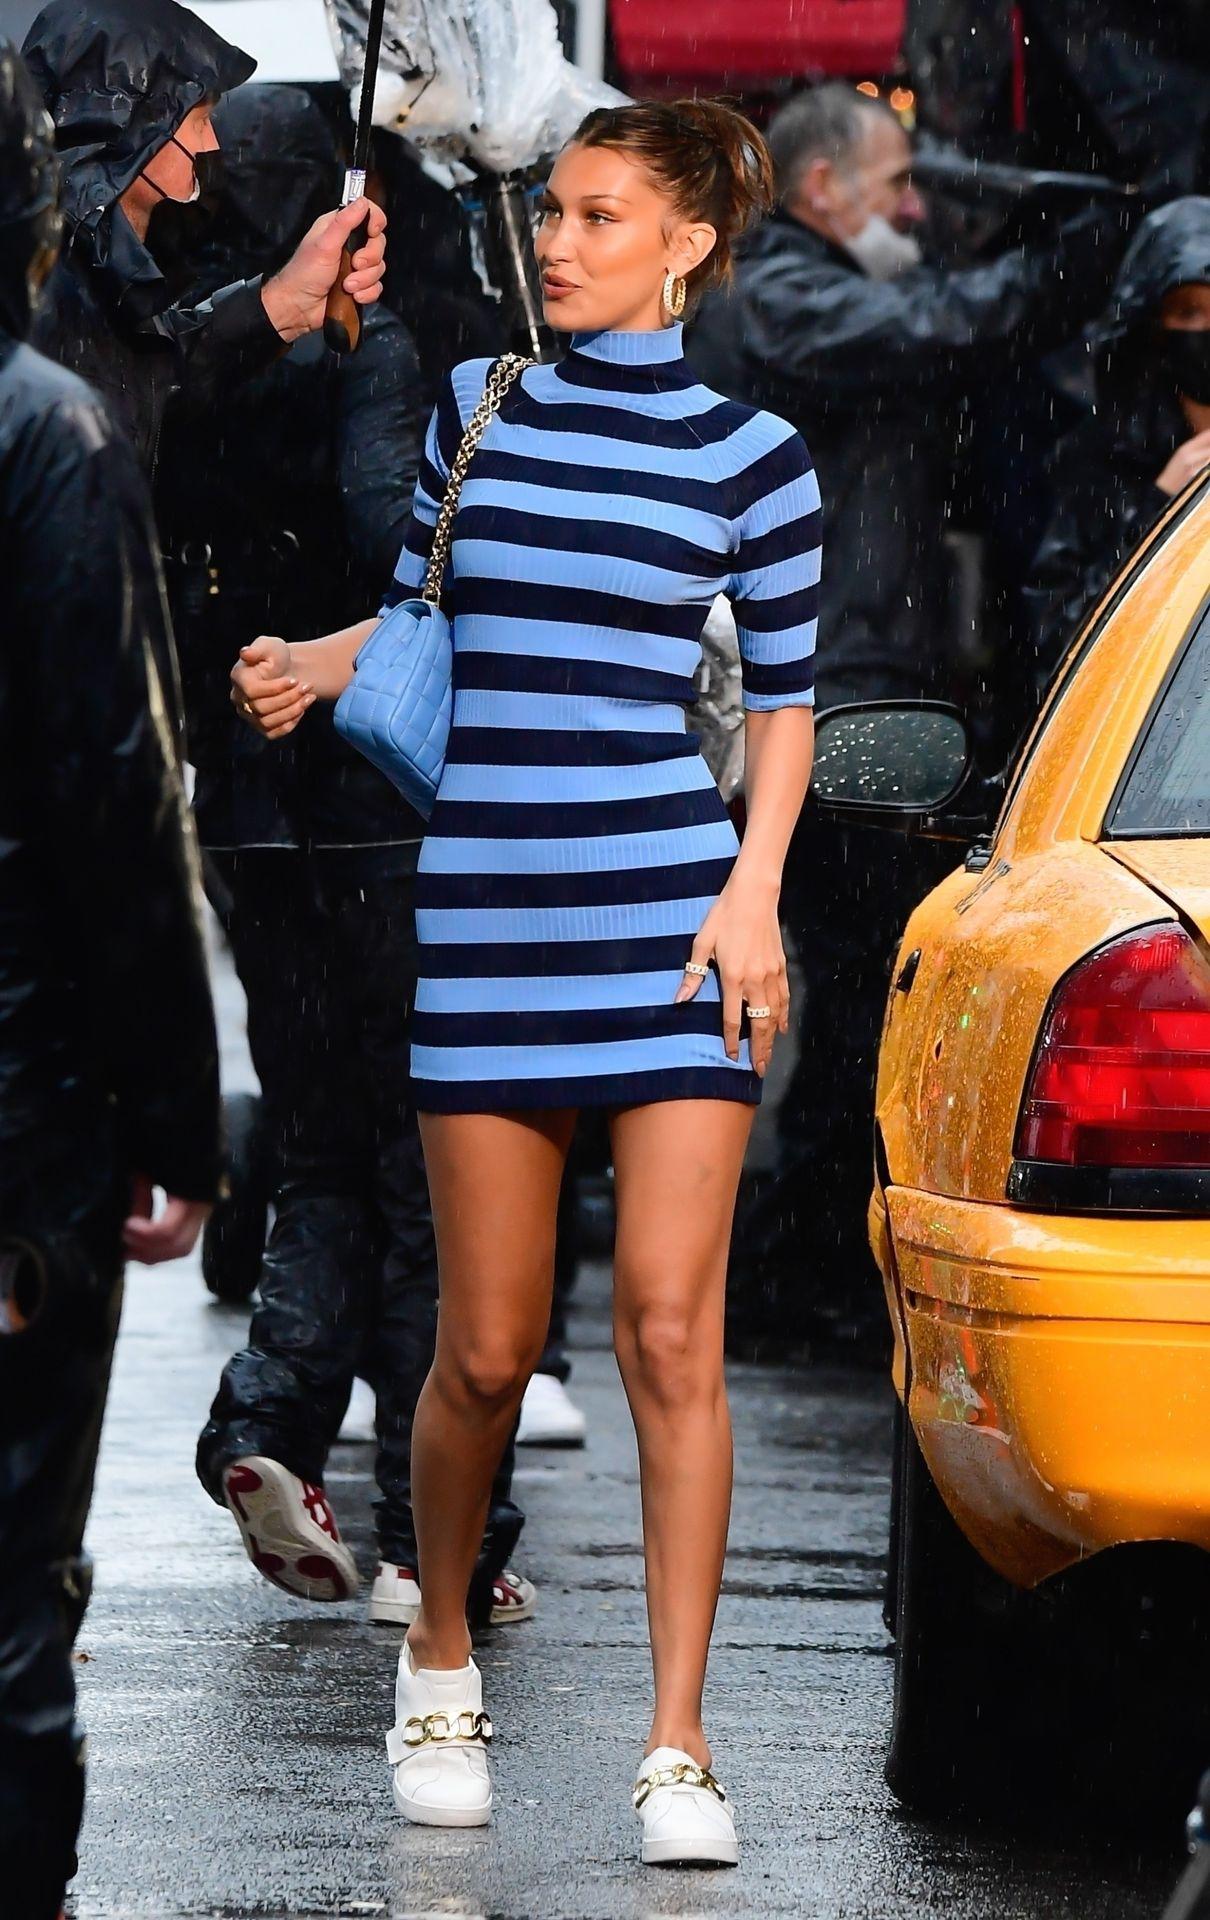 Bella Hadid Upskirt Leggy In New York